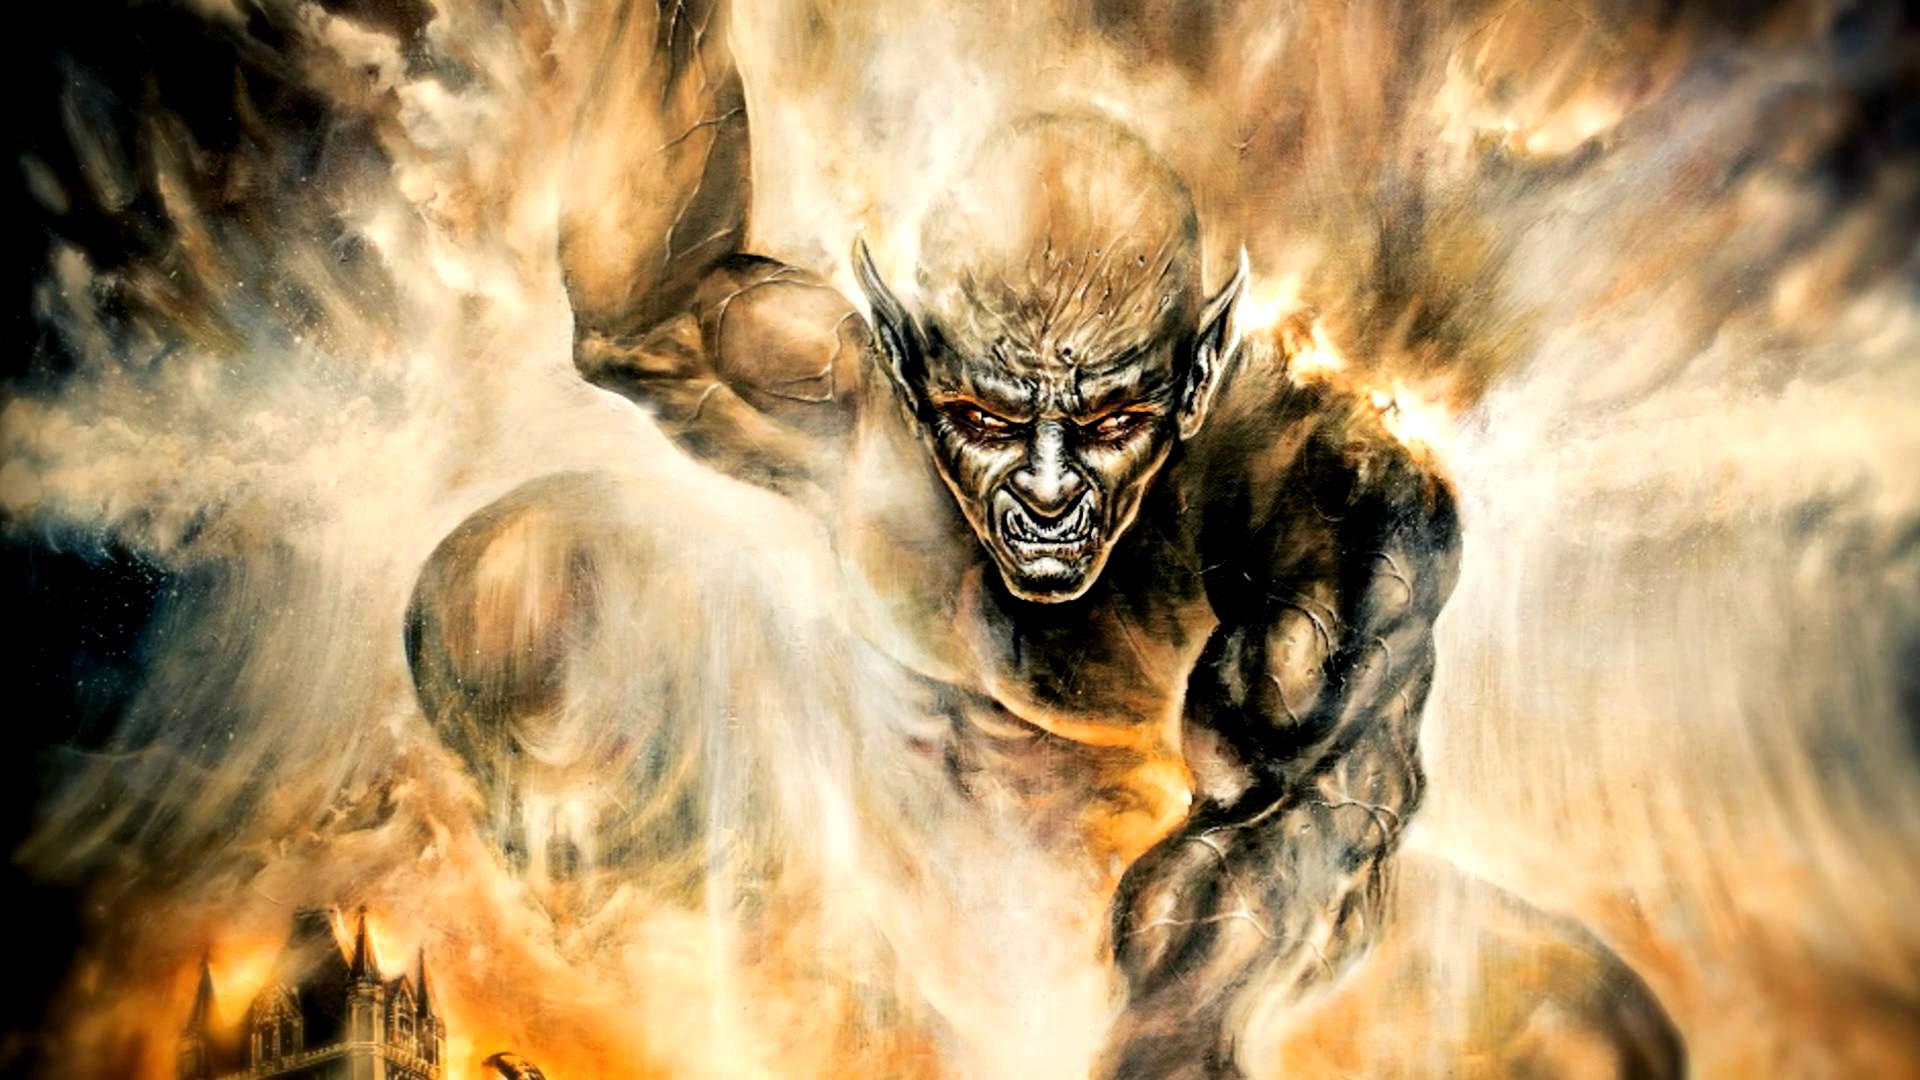 Wallpaper 1920x1080 Px Dark Demon Demons Hard Heavy